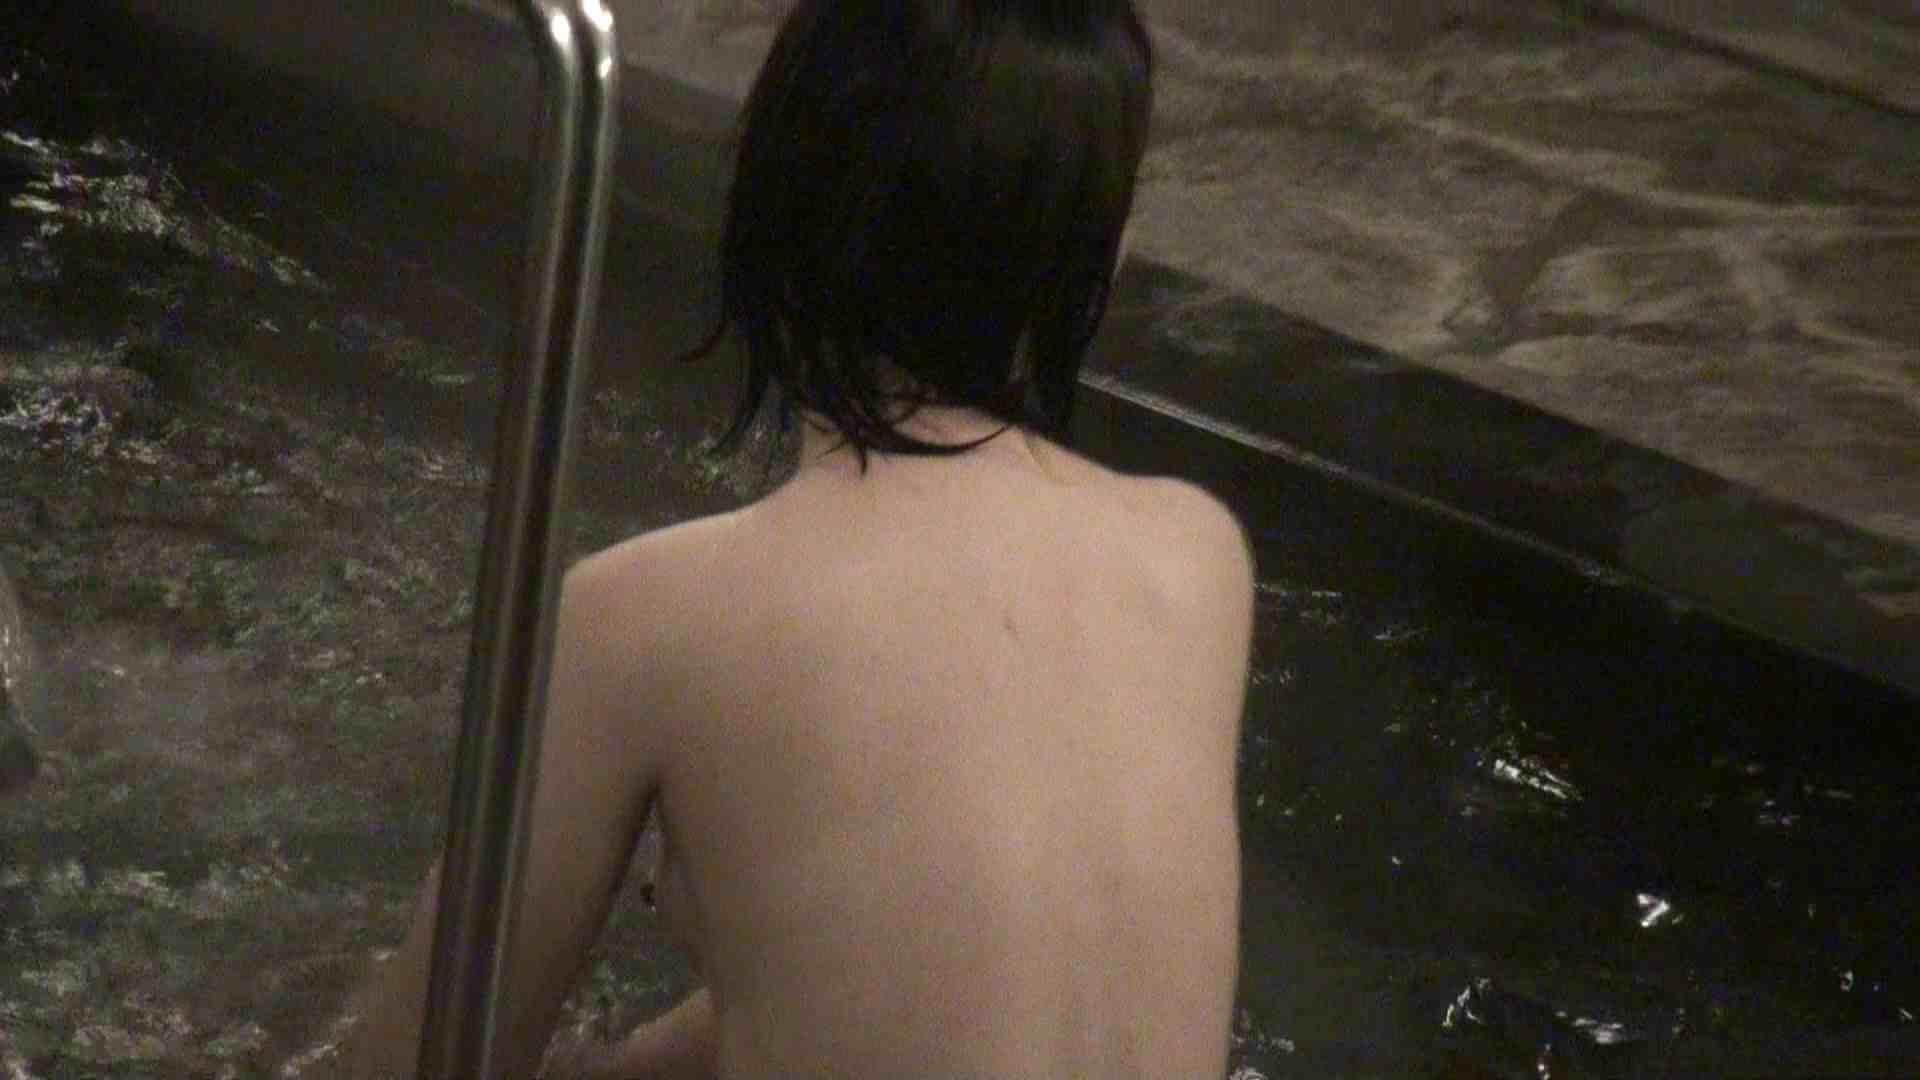 Aquaな露天風呂Vol.404 エッチな盗撮 盗み撮り動画 112pic 46